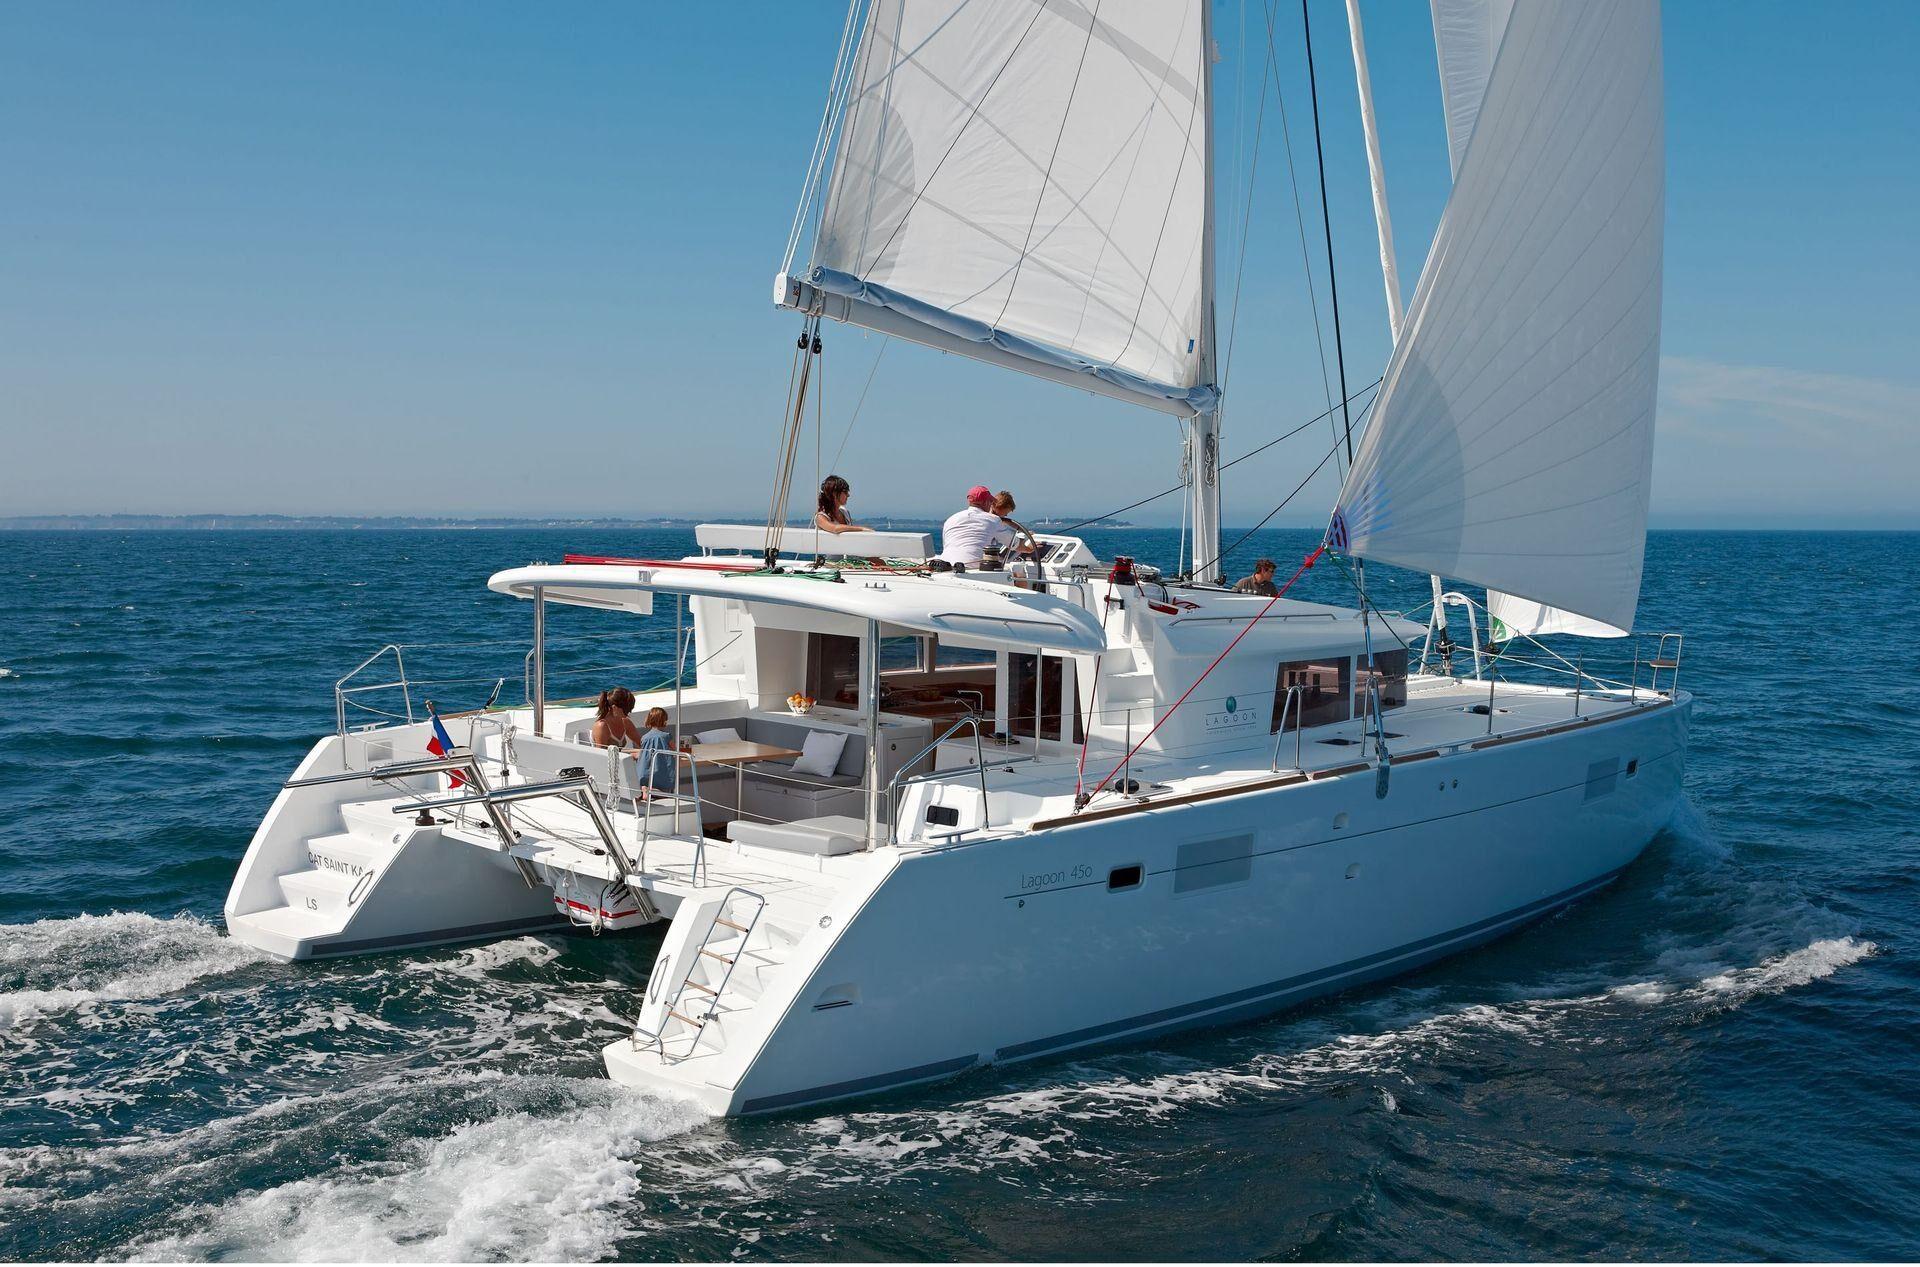 Greek island cruises from Athens with Spiridakos Sailing